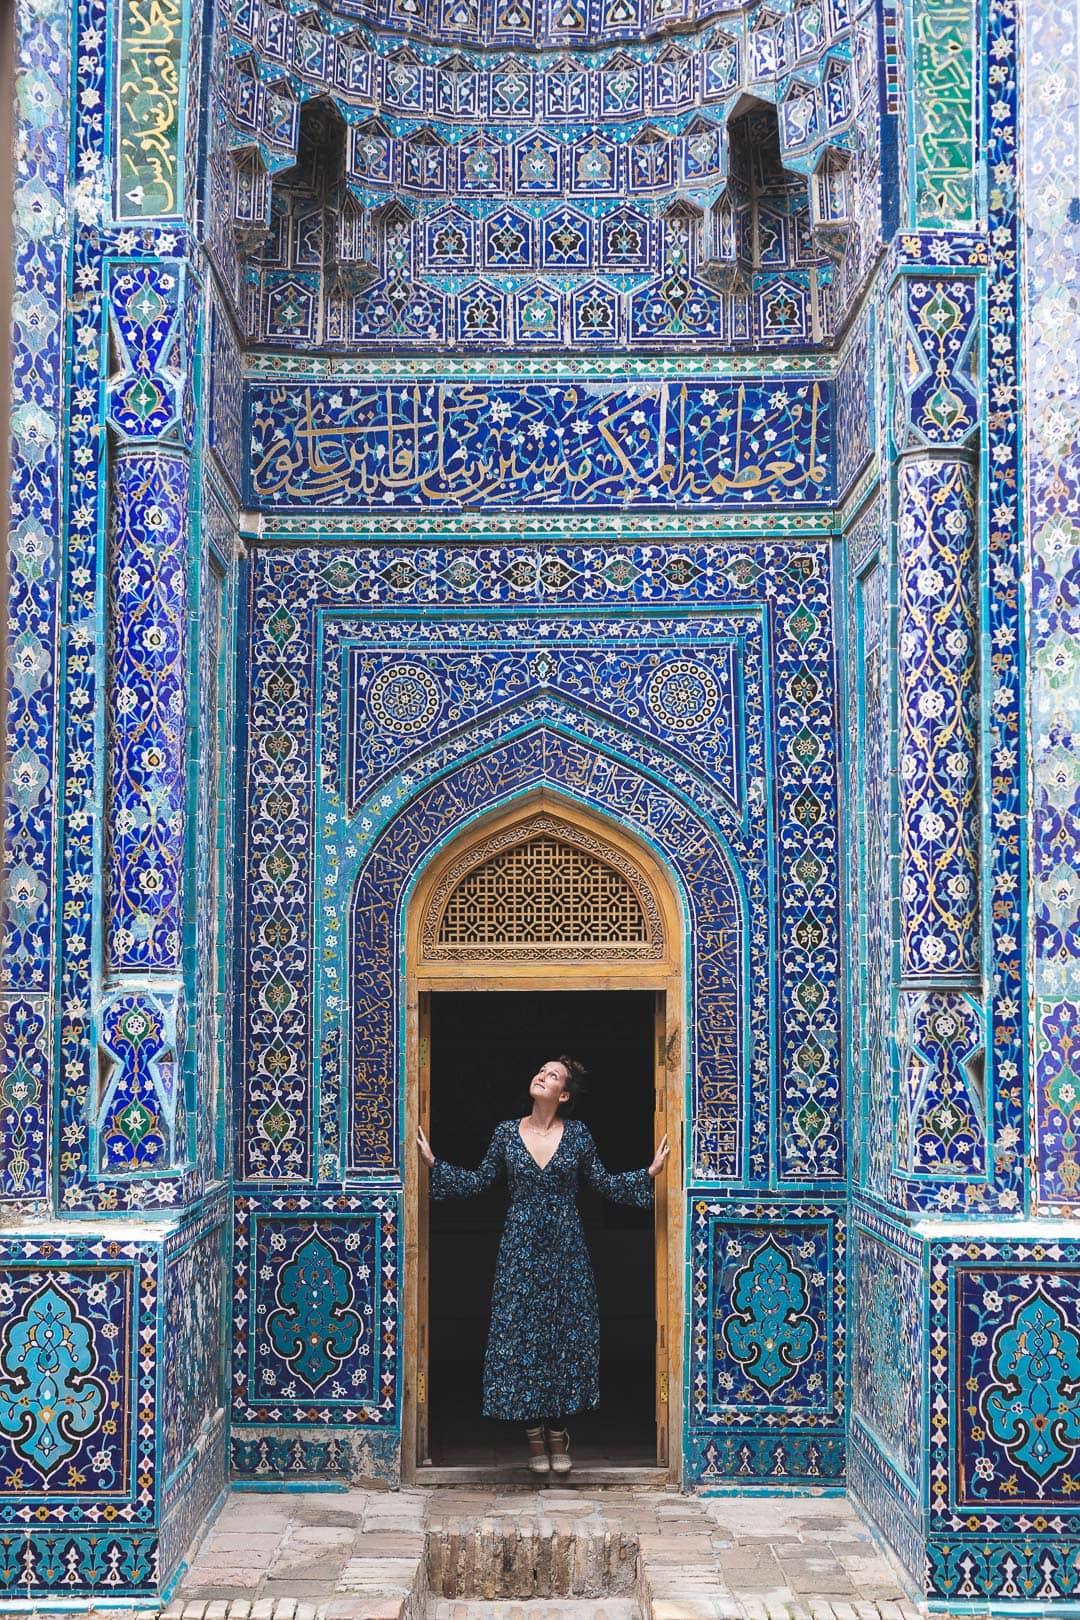 Shah-i-zinda mausoleum in Samarkand, Uzbekistan